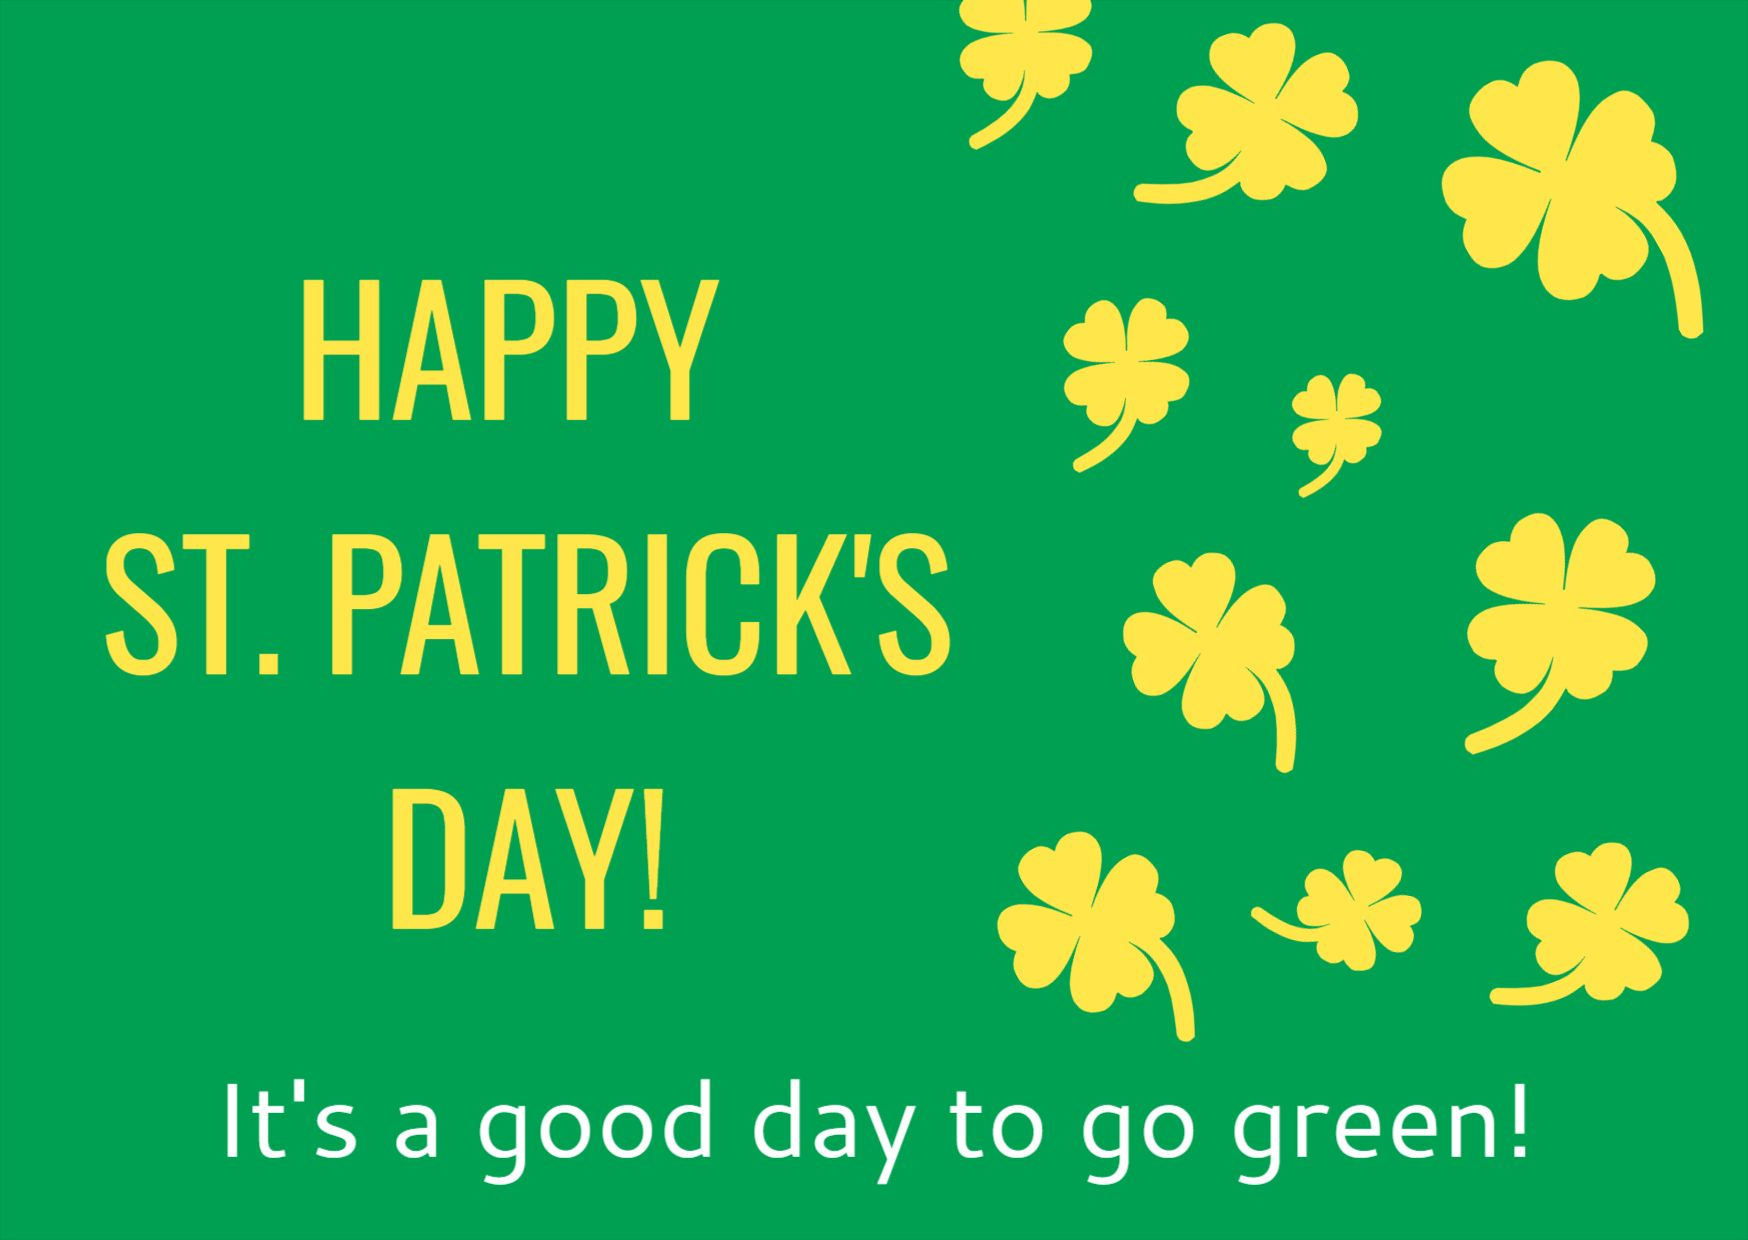 St. Patricks Day Greetings Card Design Template